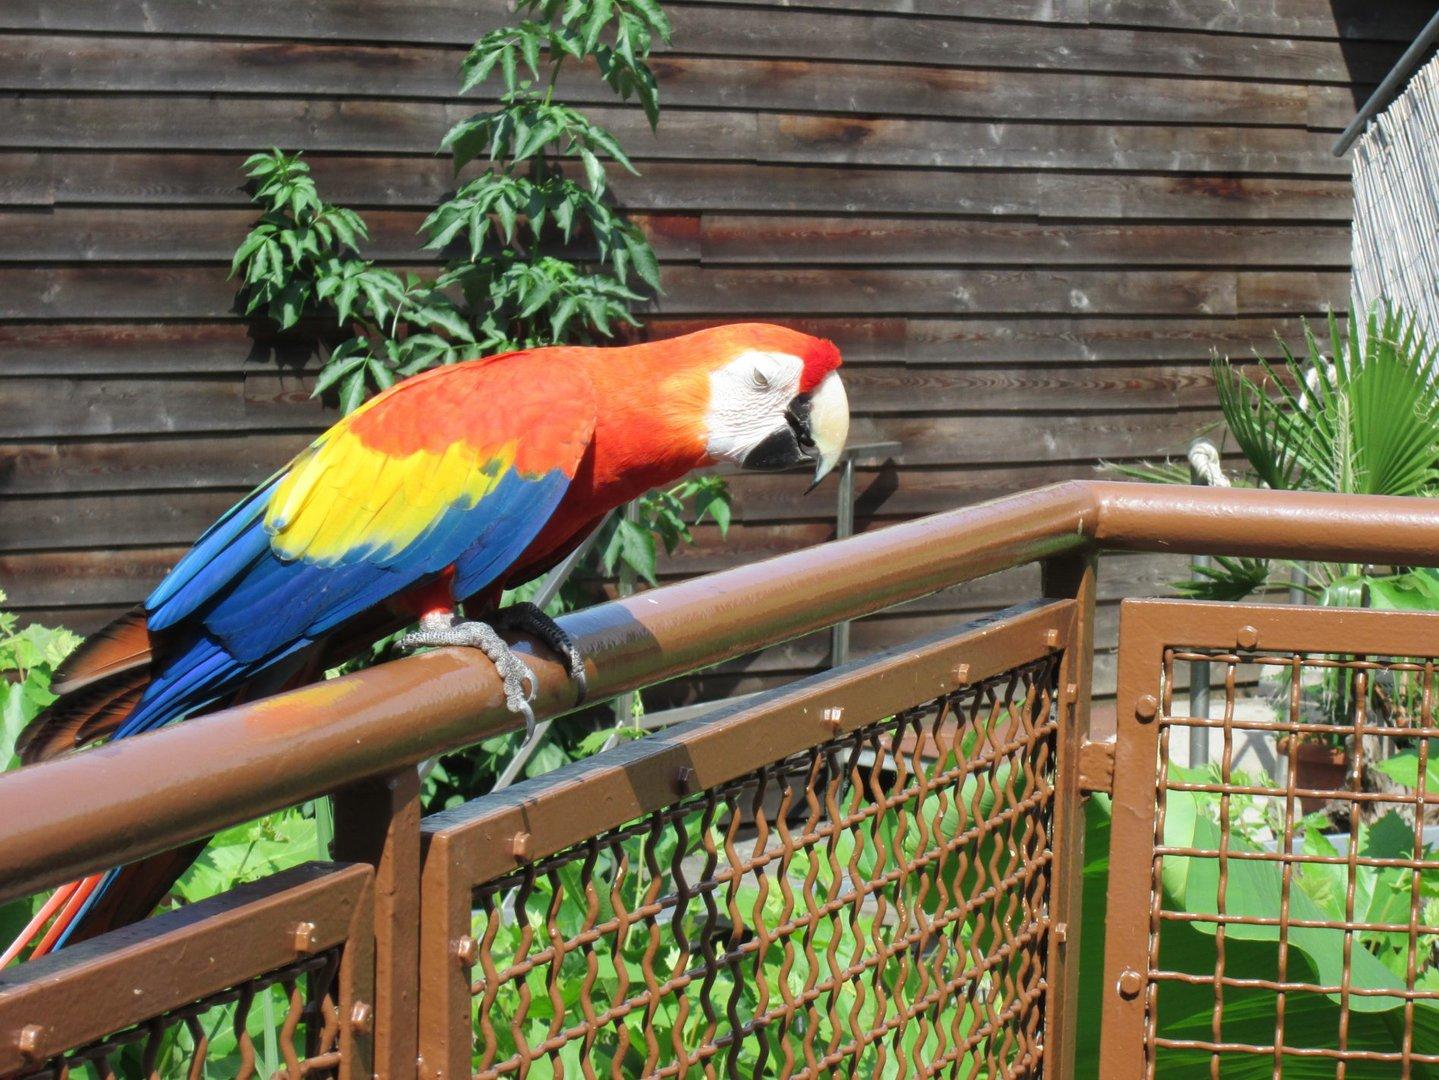 Lotti die Aradame aus dem Kölner Zoo